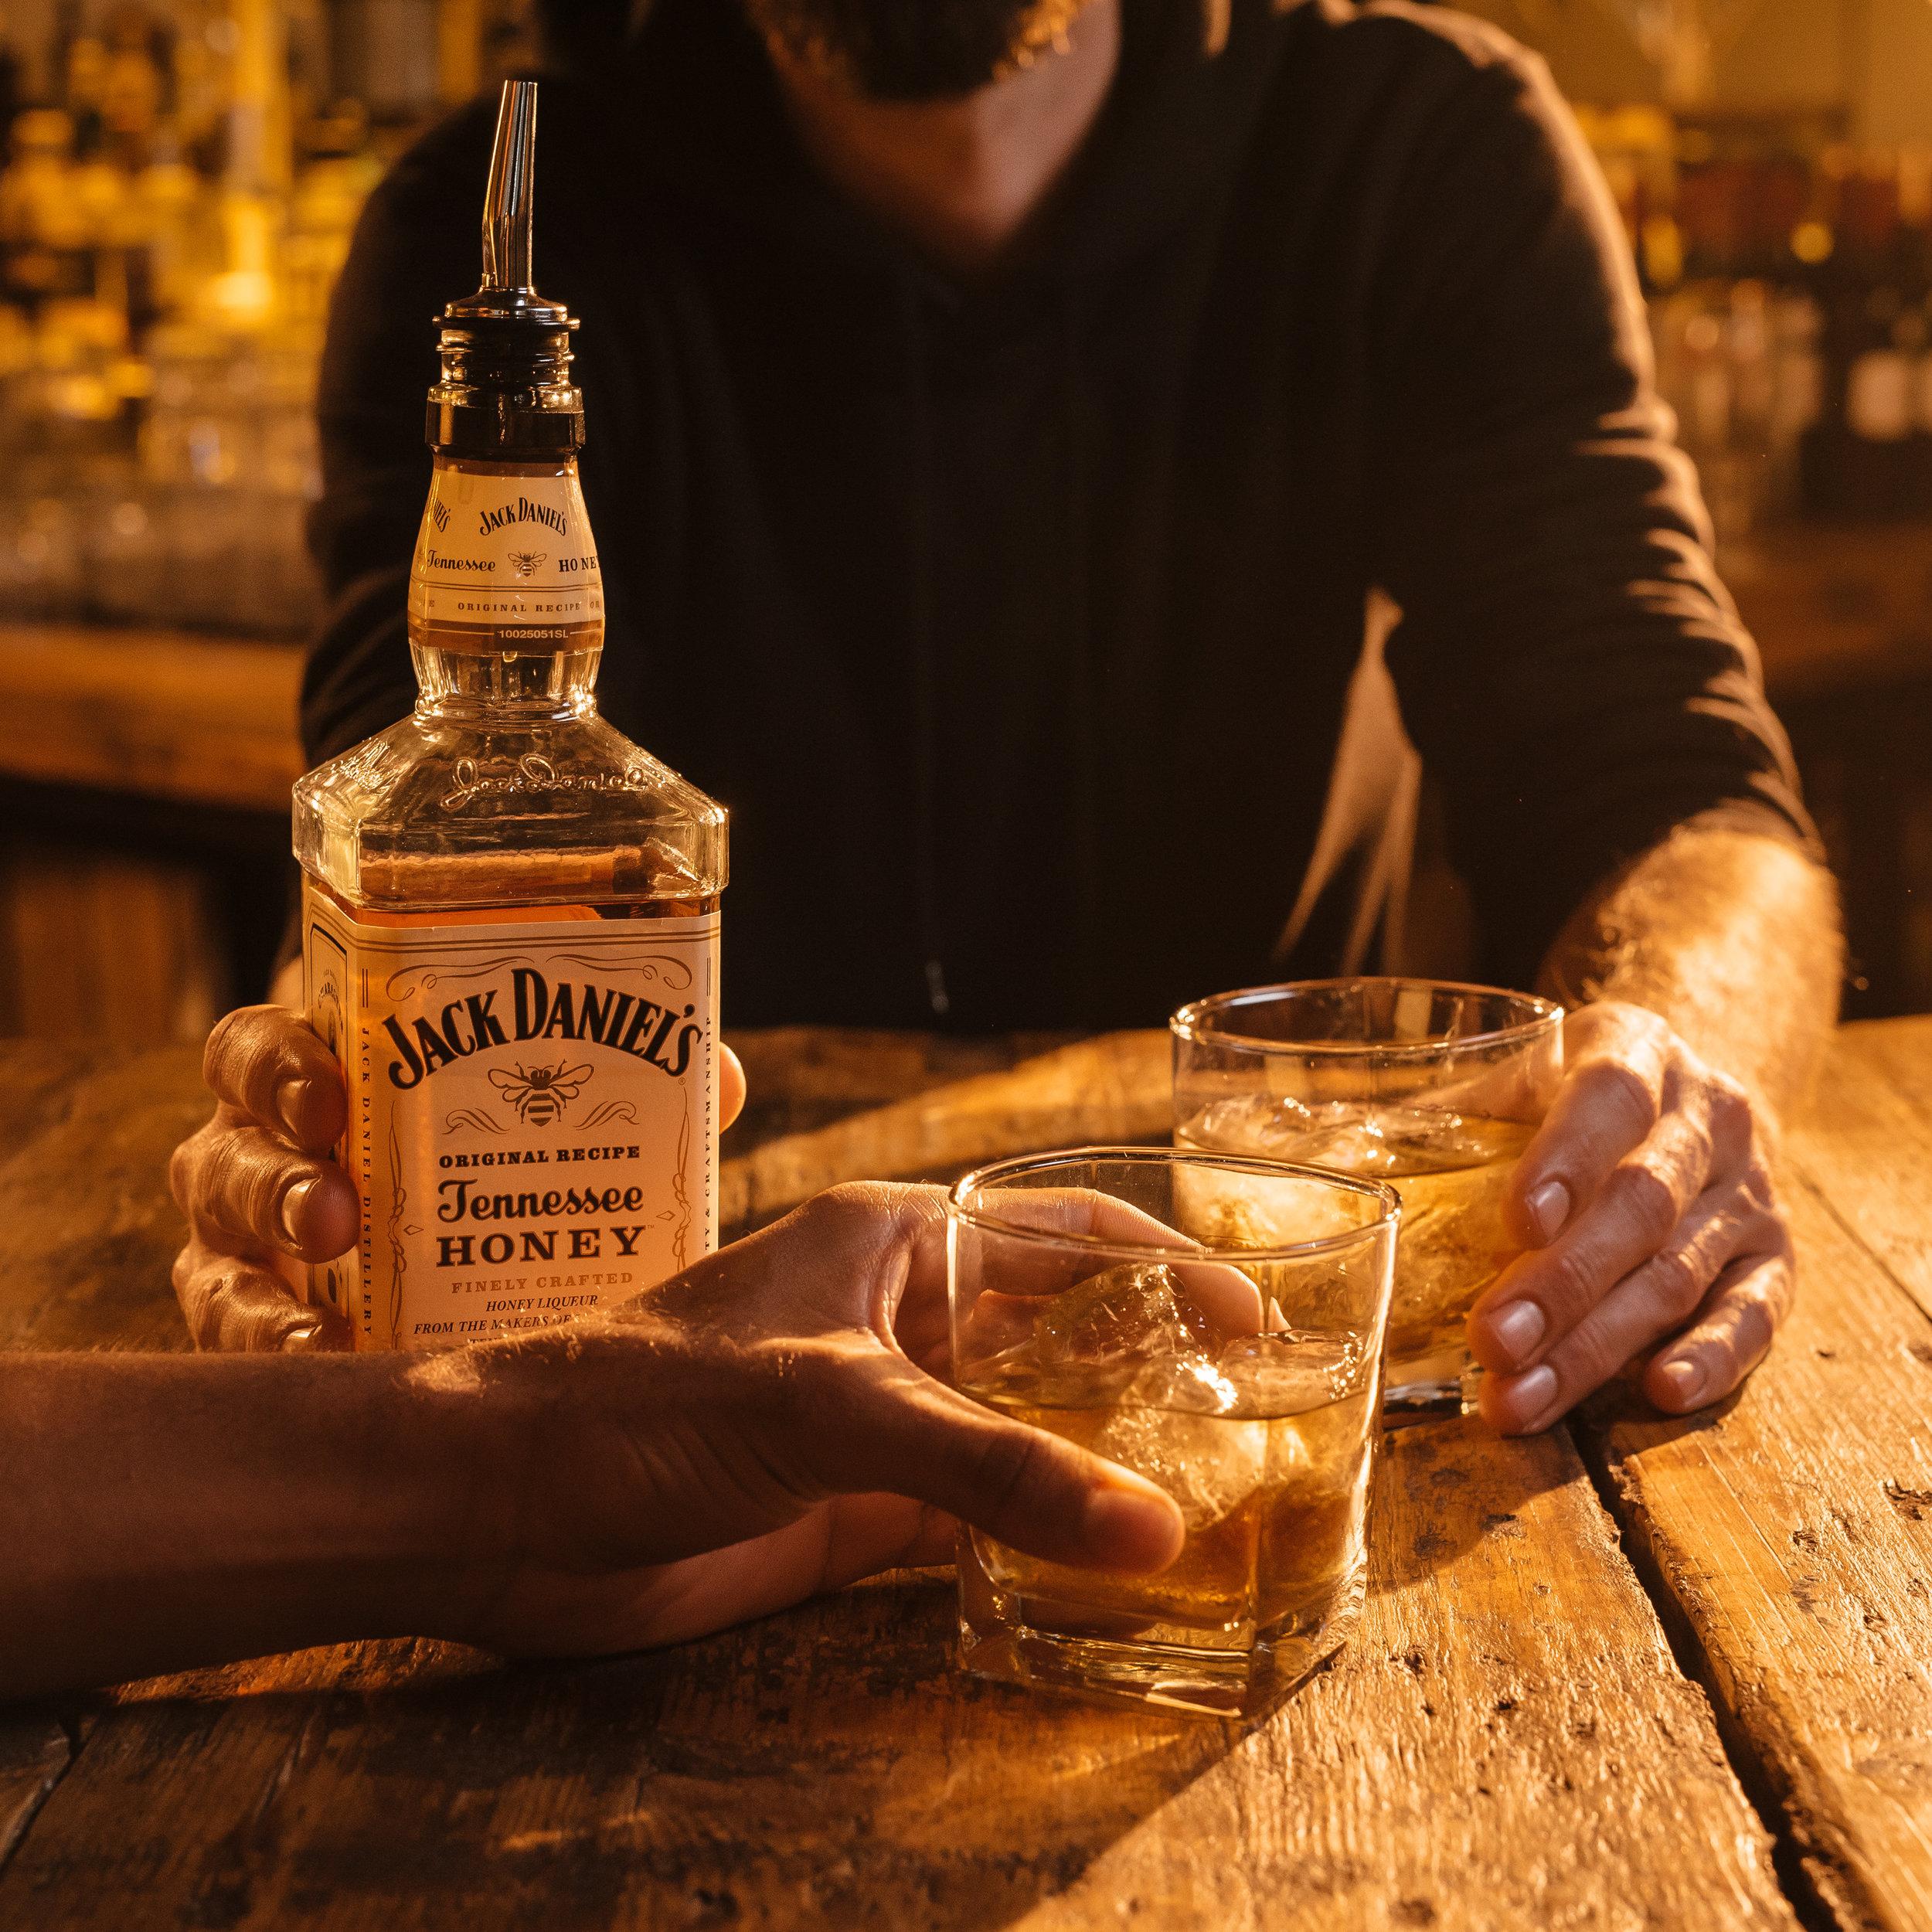 Jack Daniel's - Tennessee Honey